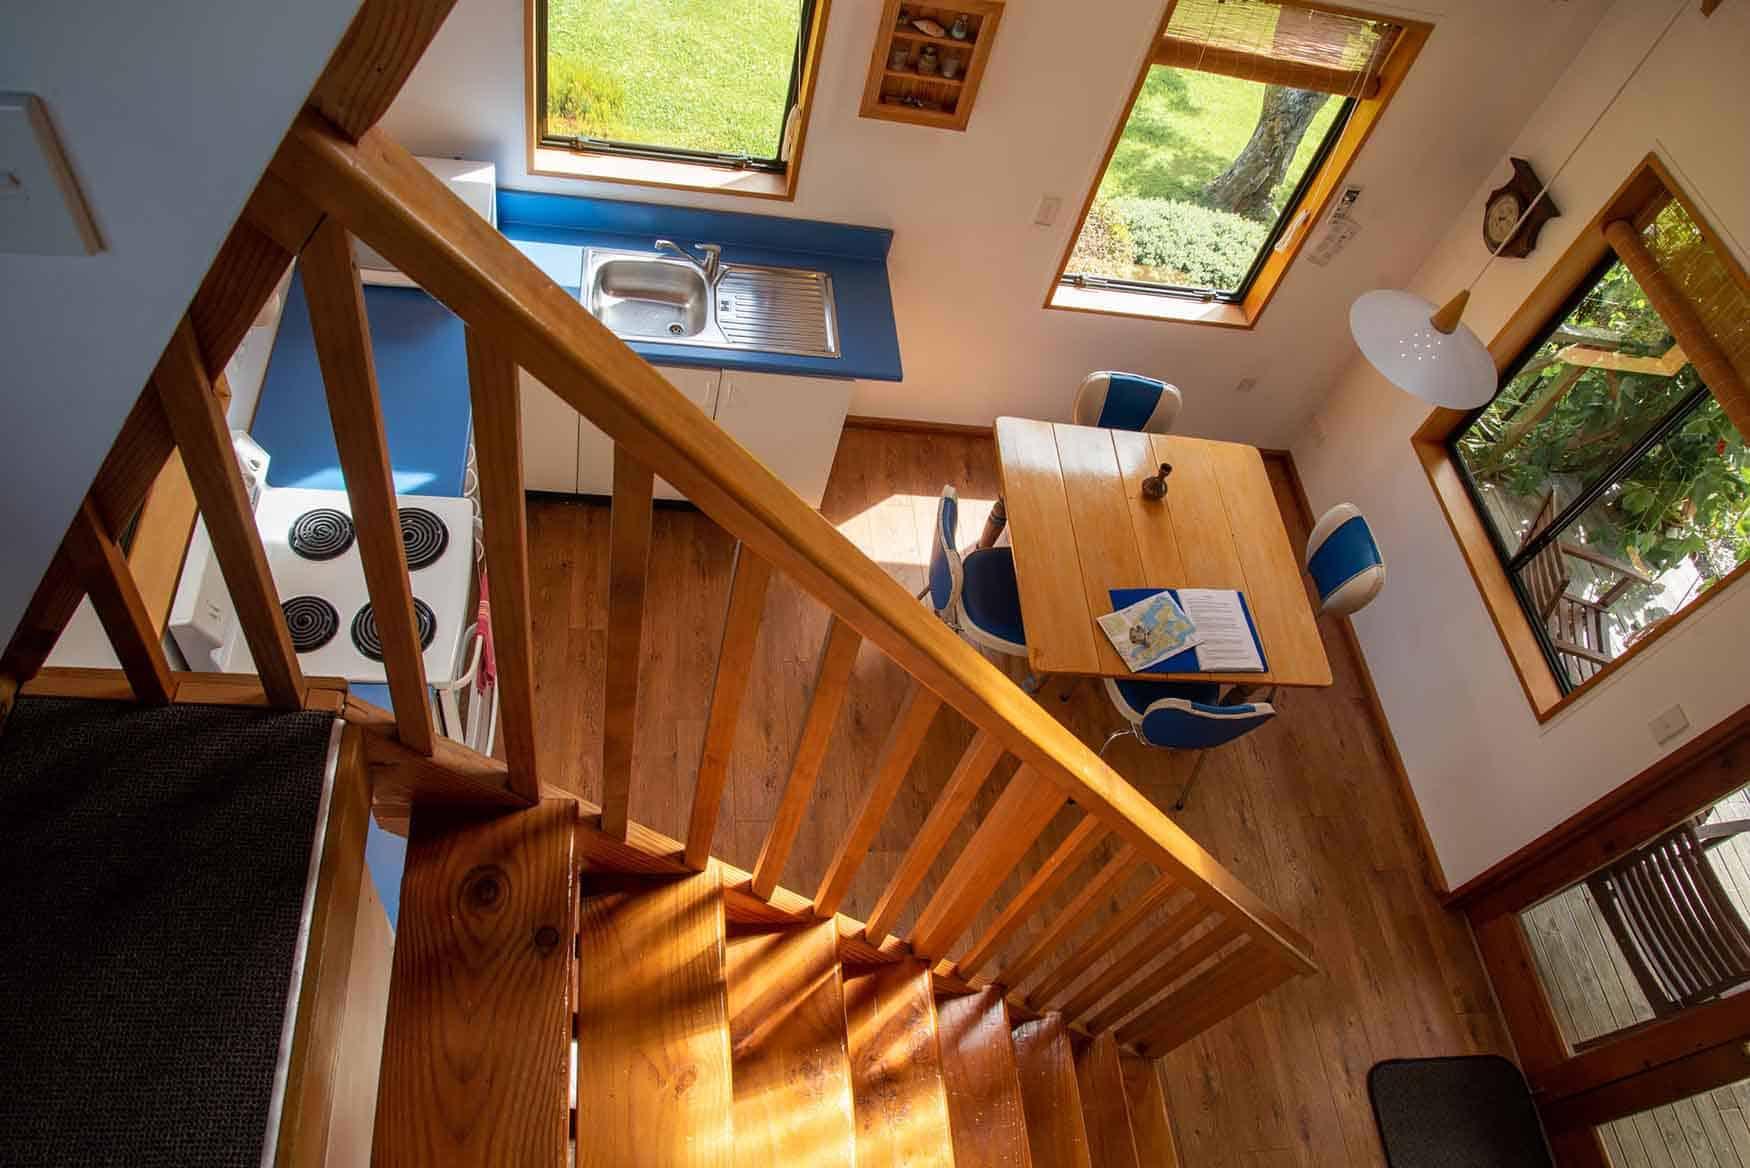 Mezzanine floor of Fantail cottage accommodation in Dunedin